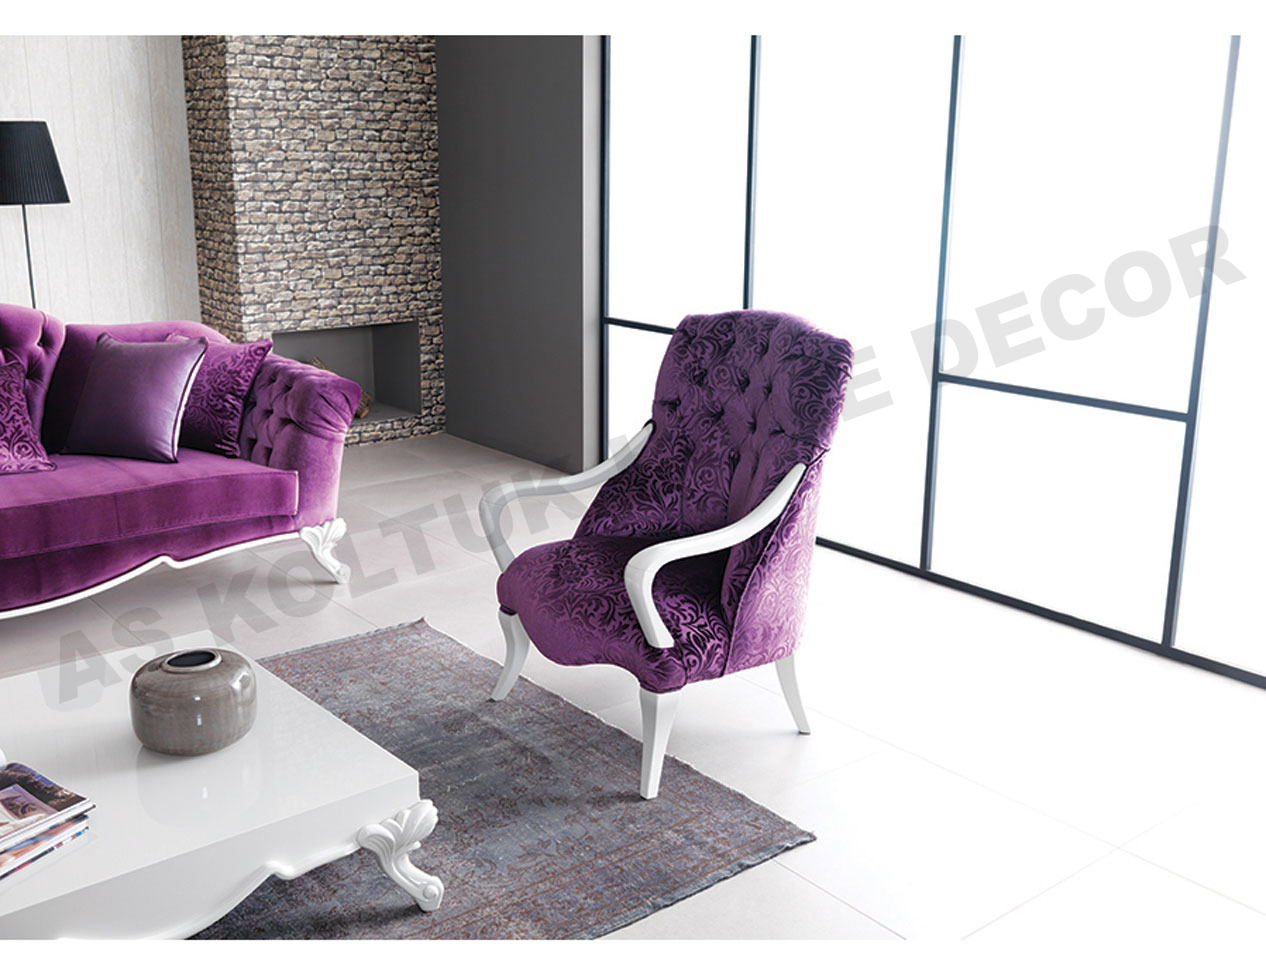 purple sofas for sale consumer reports sofa recliners as koltuk home decor classic set